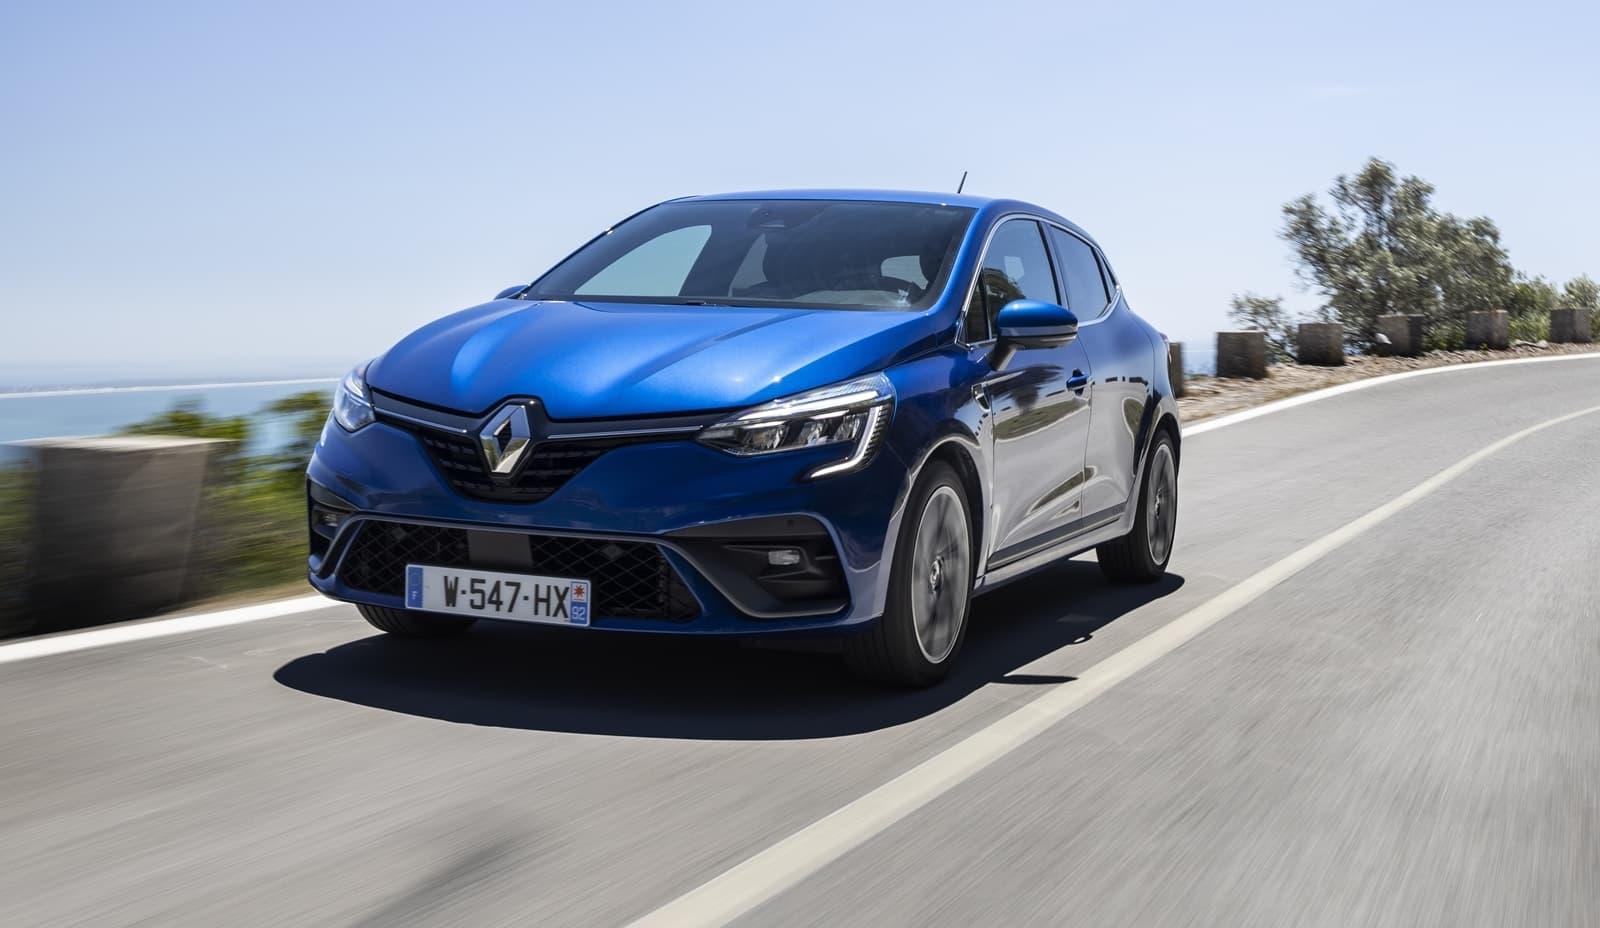 Renault Clio 2020 Prueba 0619 027